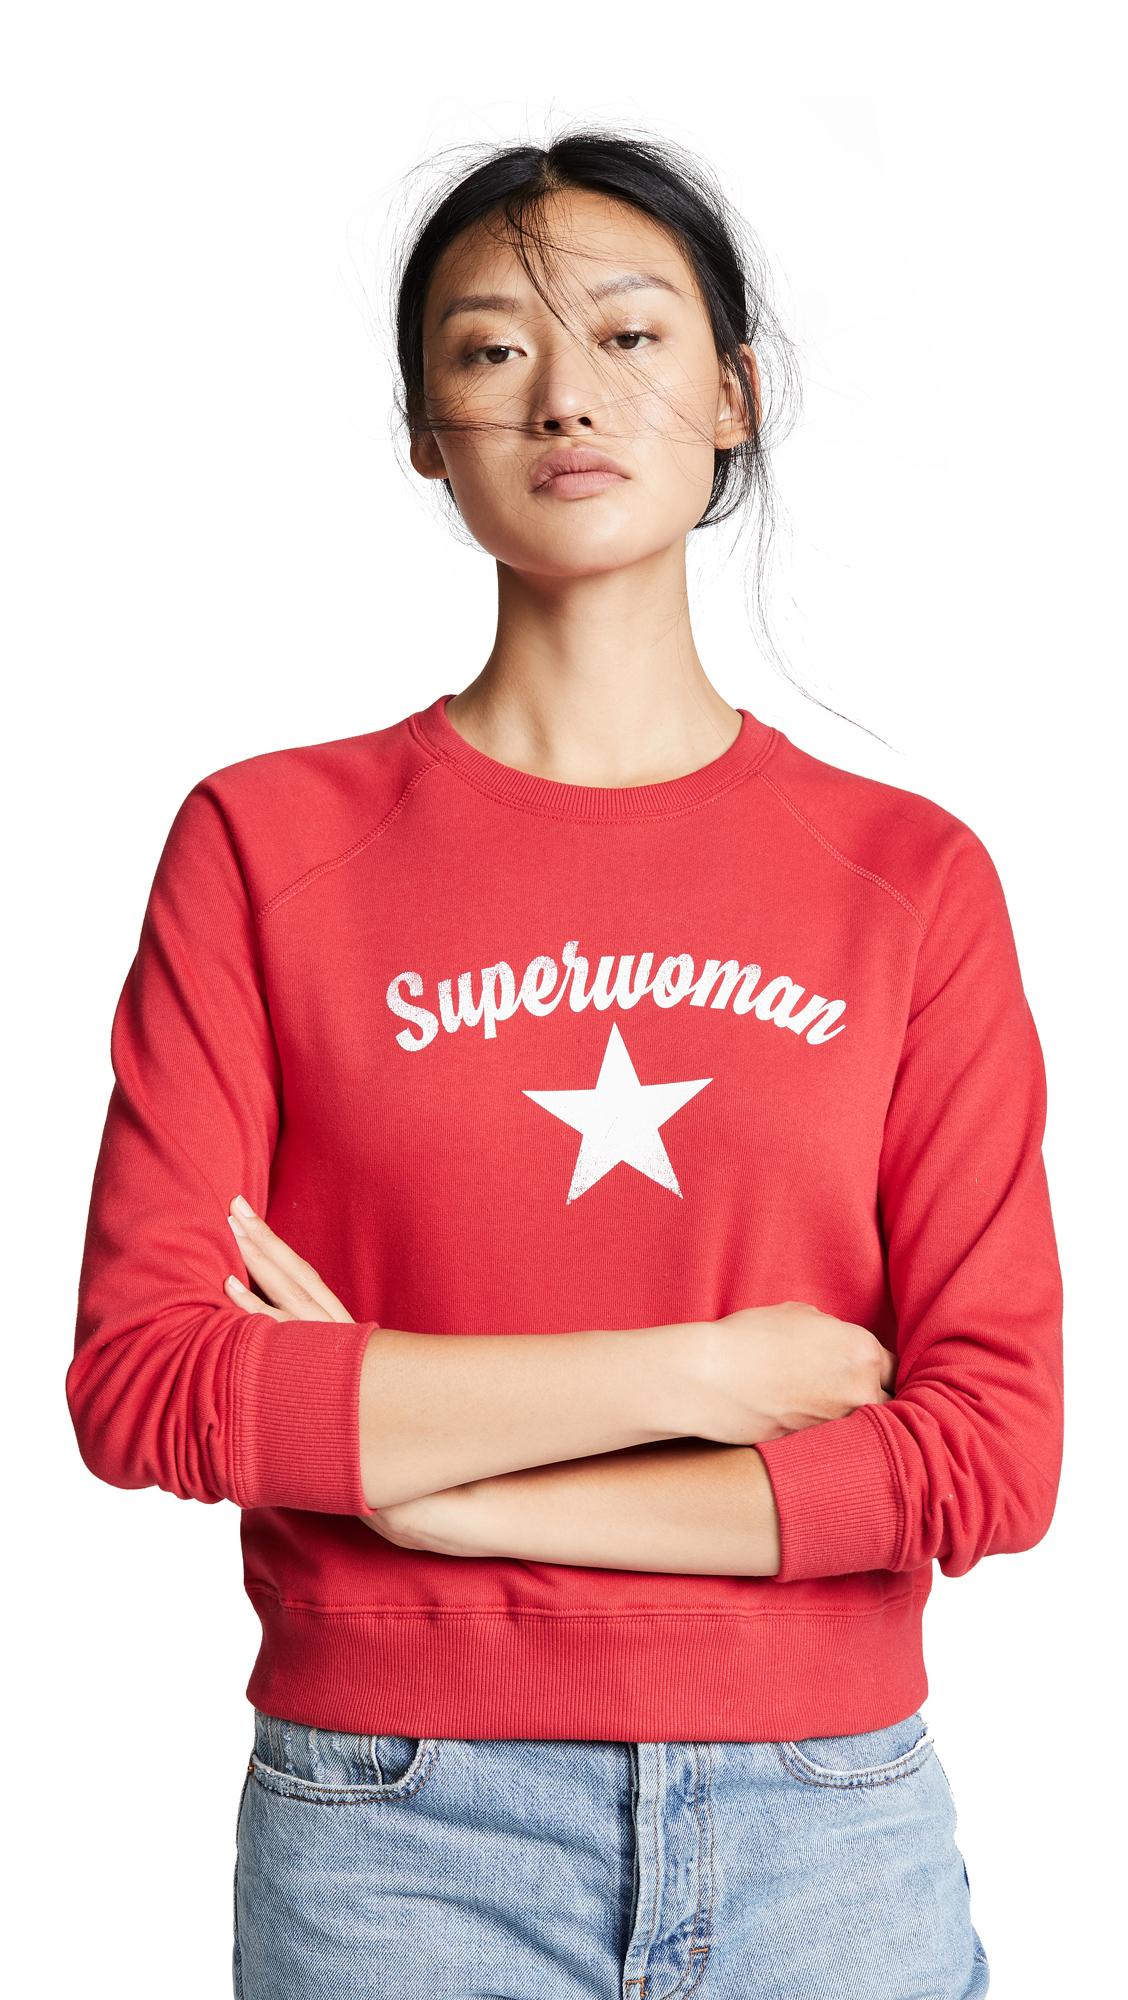 Rebecca Minkoff Superwoman Sweatshirt In Red/Cream